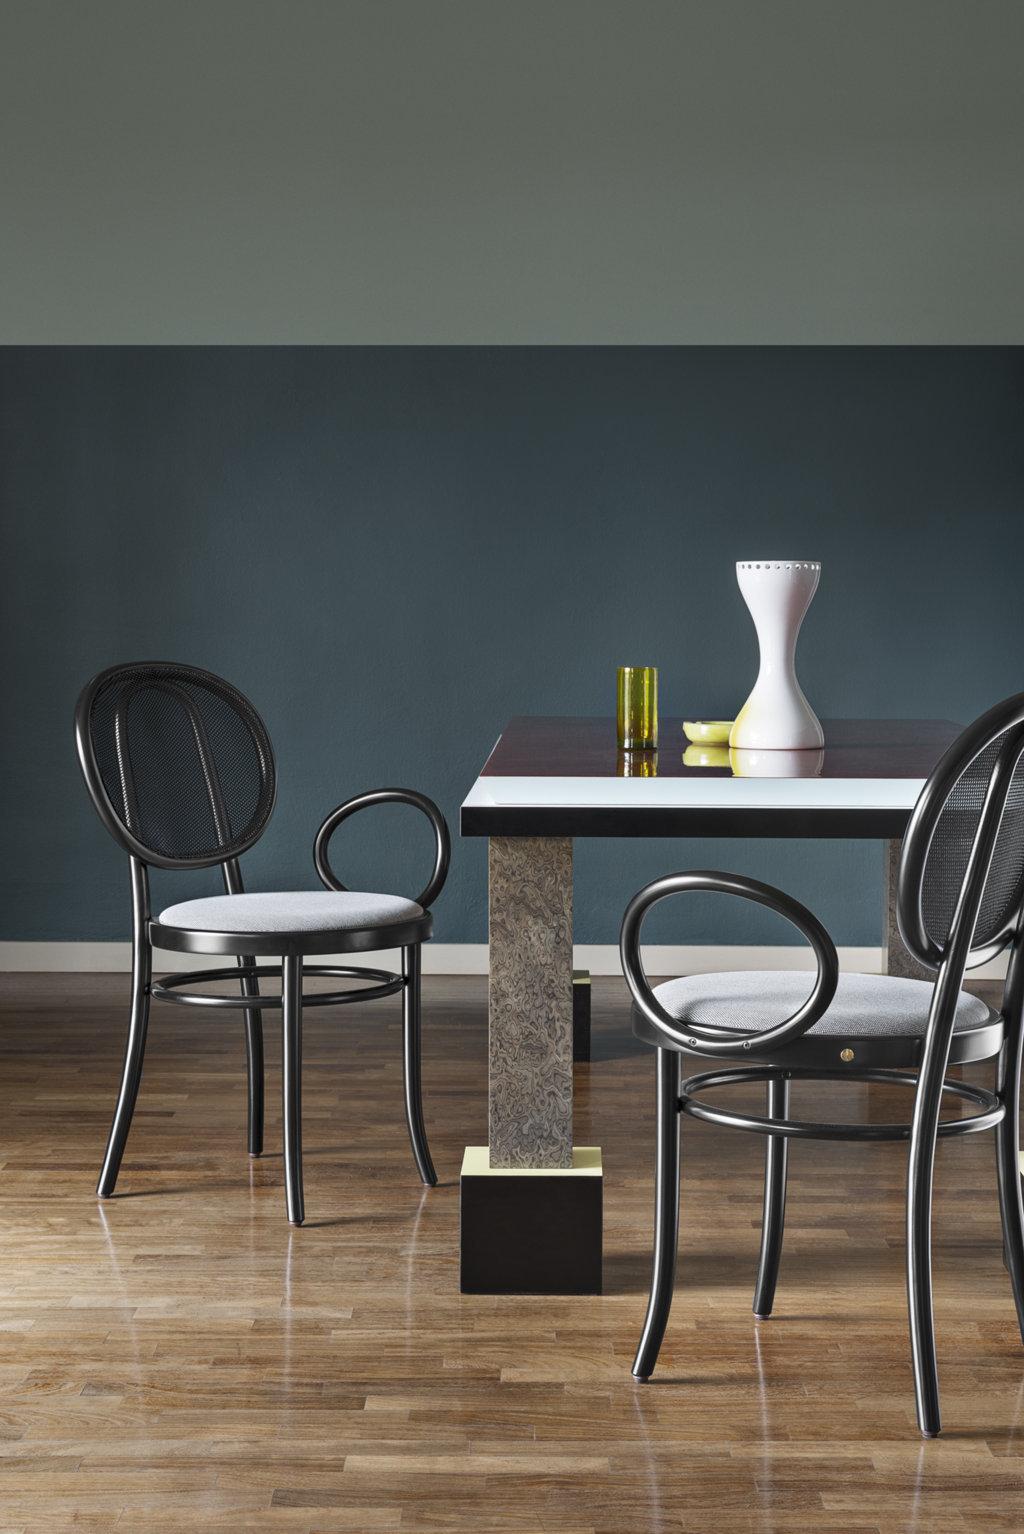 GTV_Chair-nr.-0_-design-by-Front-2017-FILEminimizer.jpg